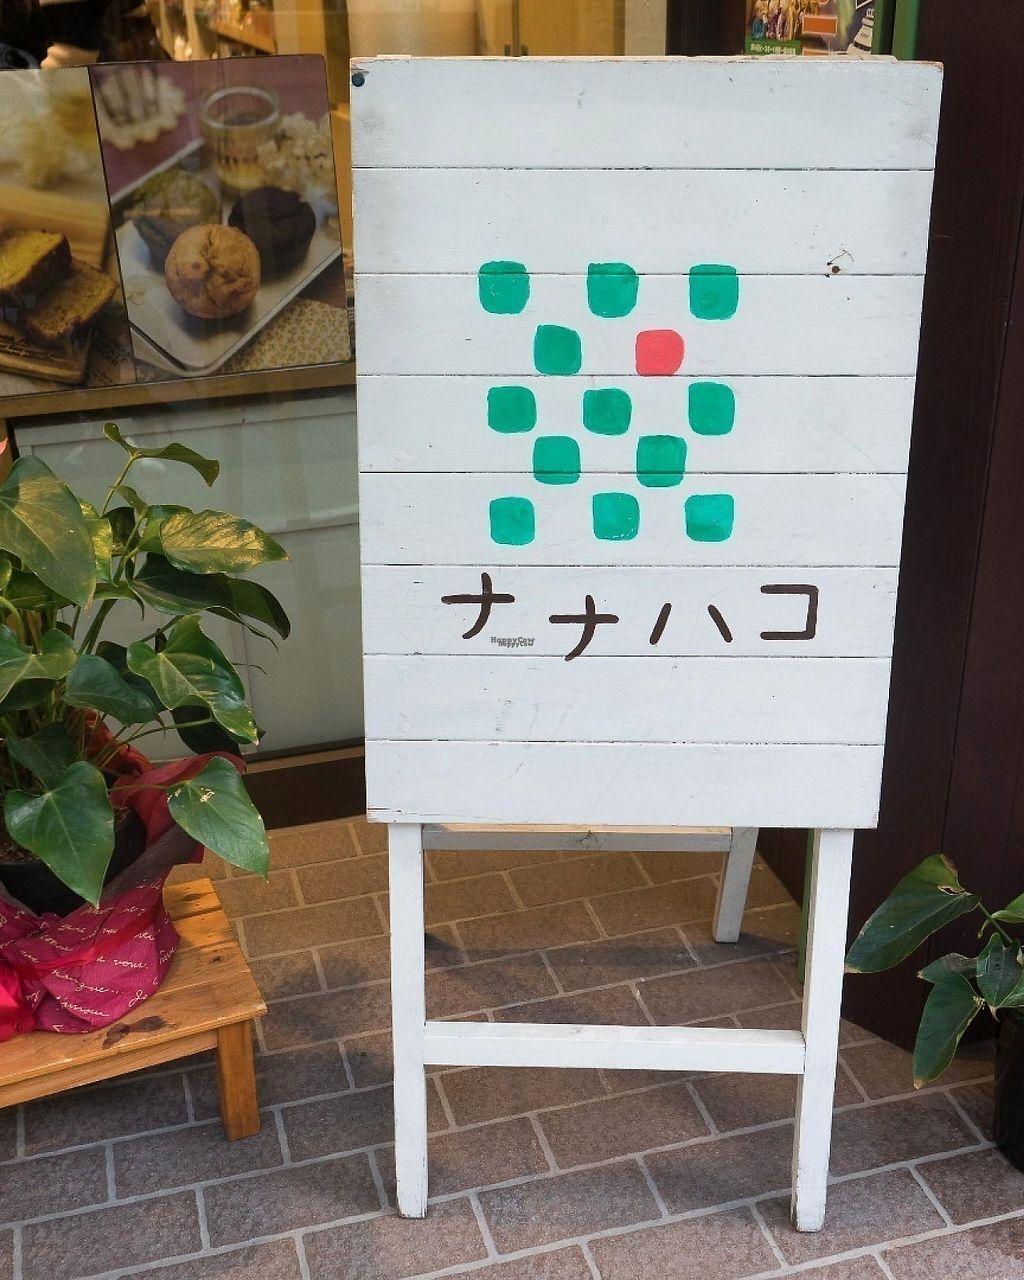 "Photo of Nanahako Macrobiotic Sweets  by <a href=""/members/profile/EmmaCebuliak"">EmmaCebuliak</a> <br/>Nanahako in Japanese <br/> March 14, 2017  - <a href='/contact/abuse/image/52988/236425'>Report</a>"